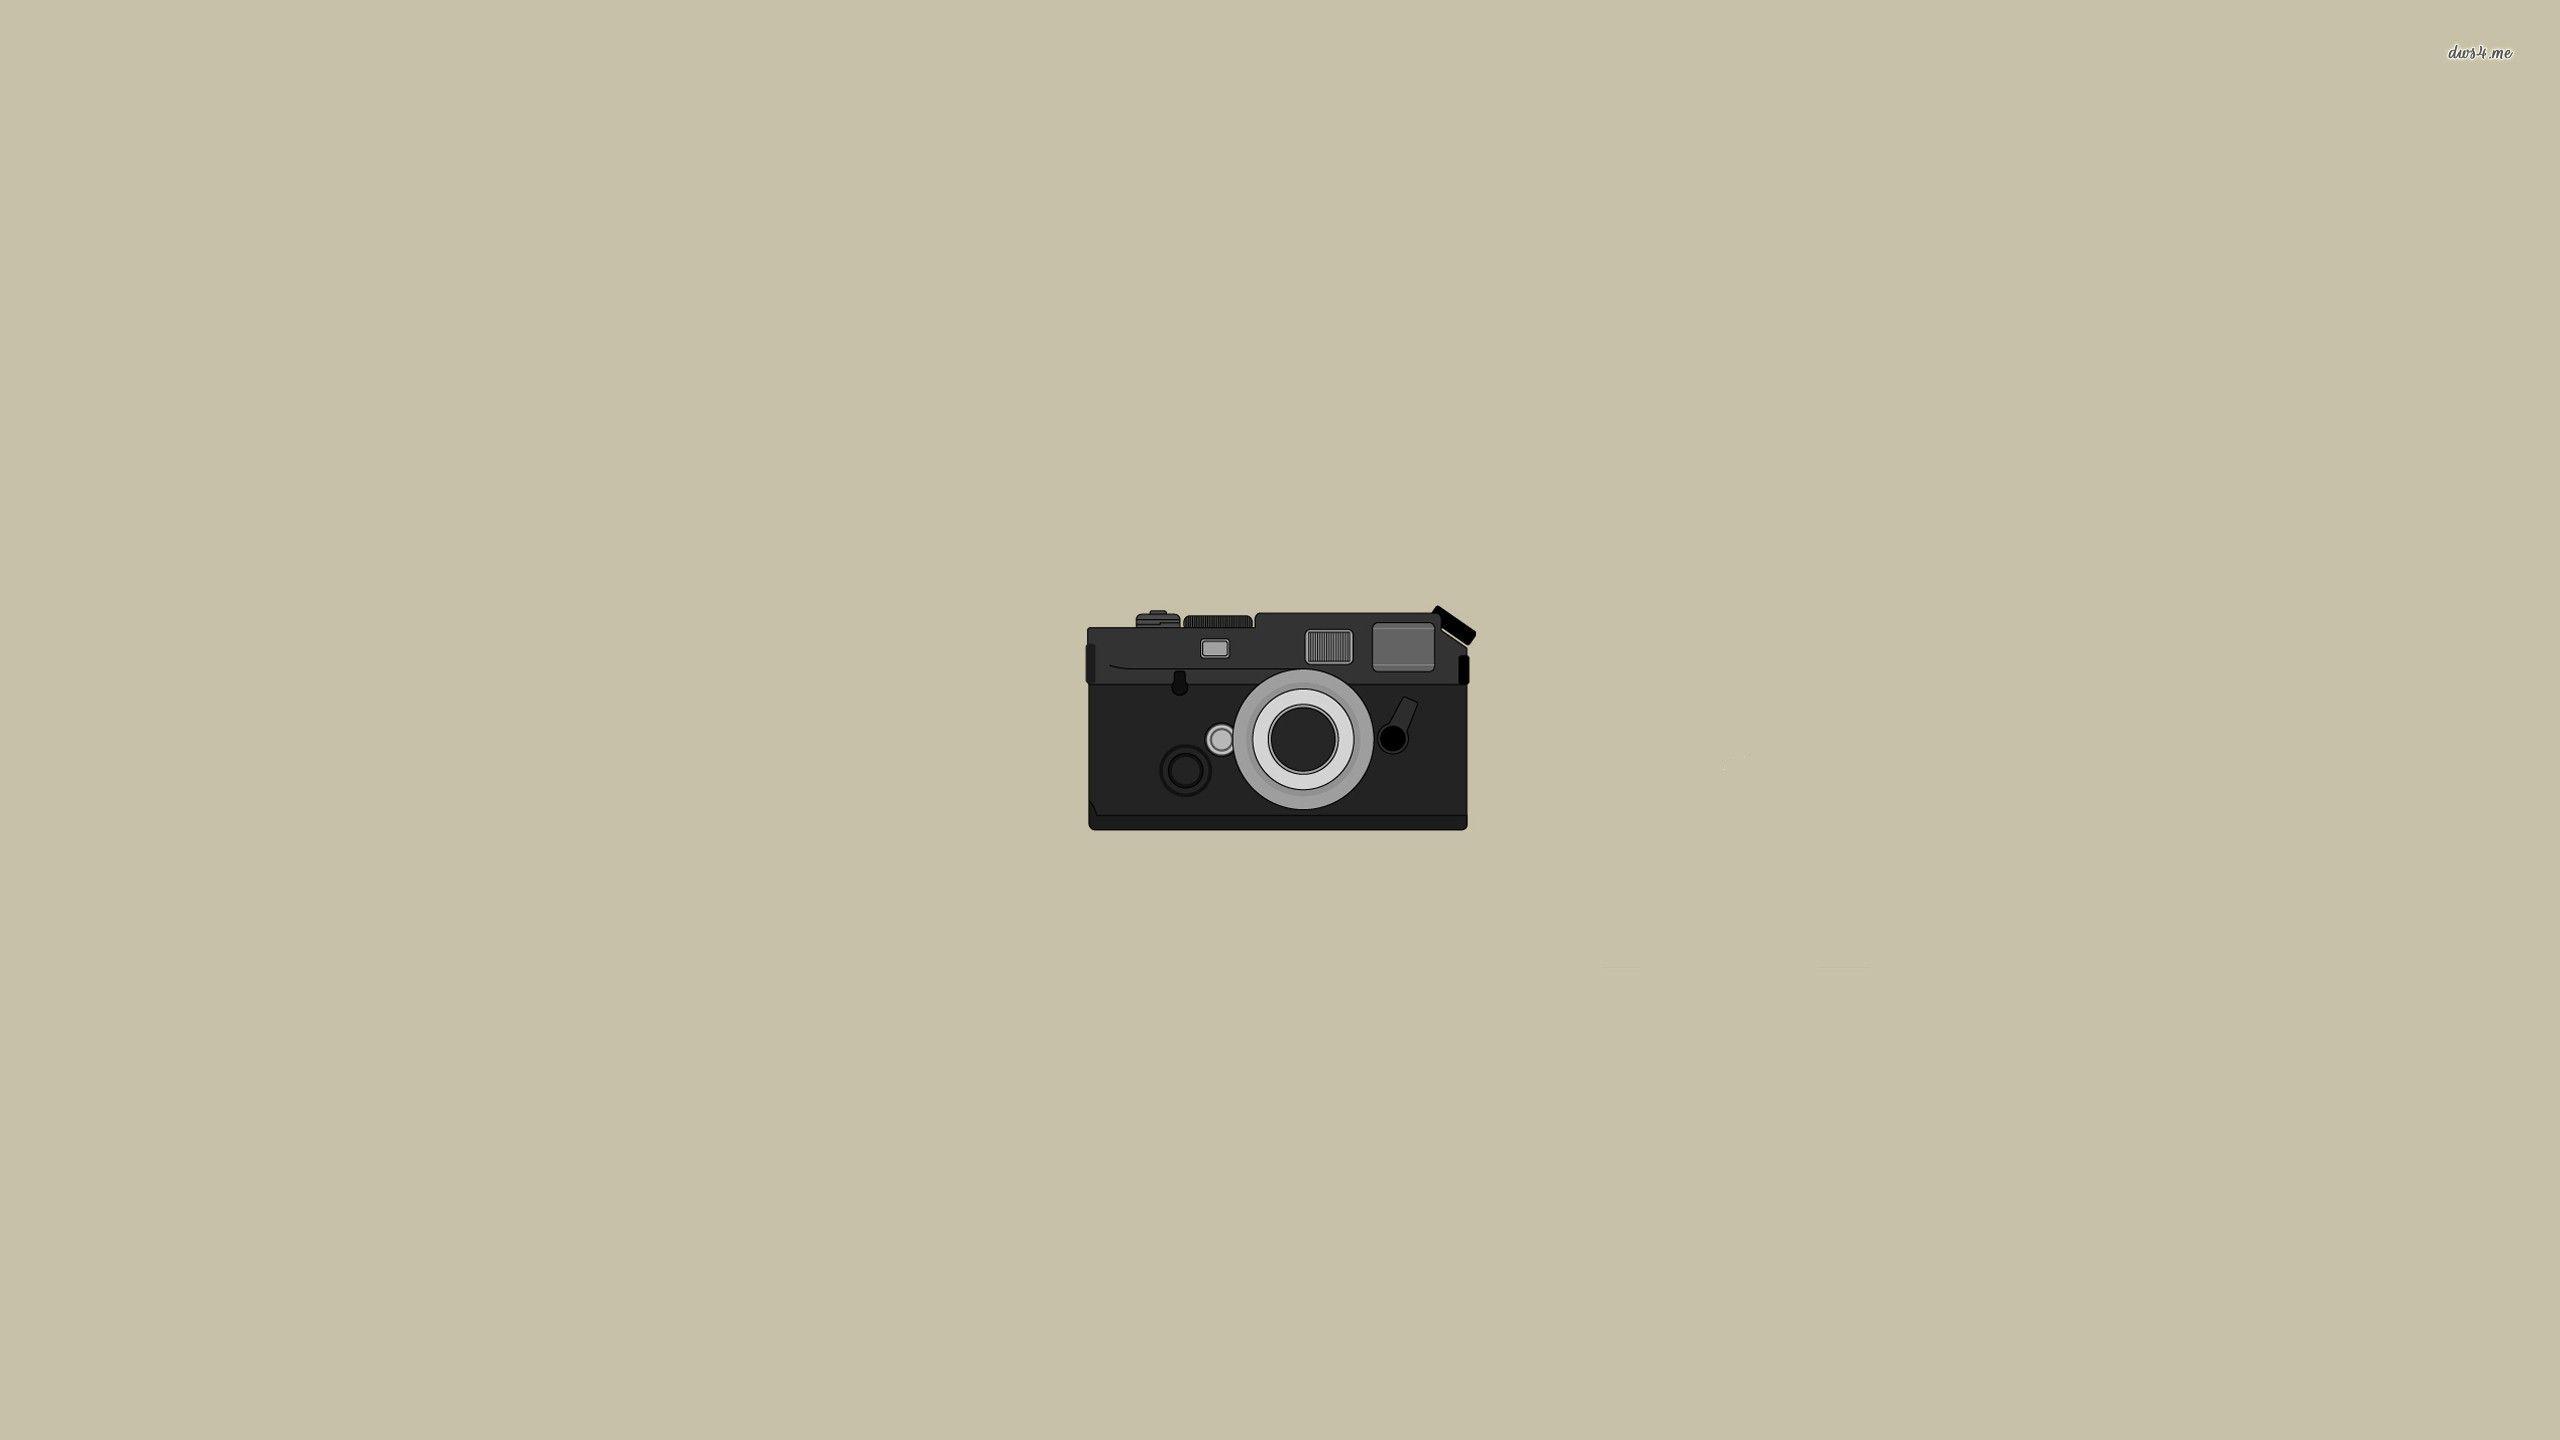 Camera Minimalist Wallpaper Simple Camera Camera